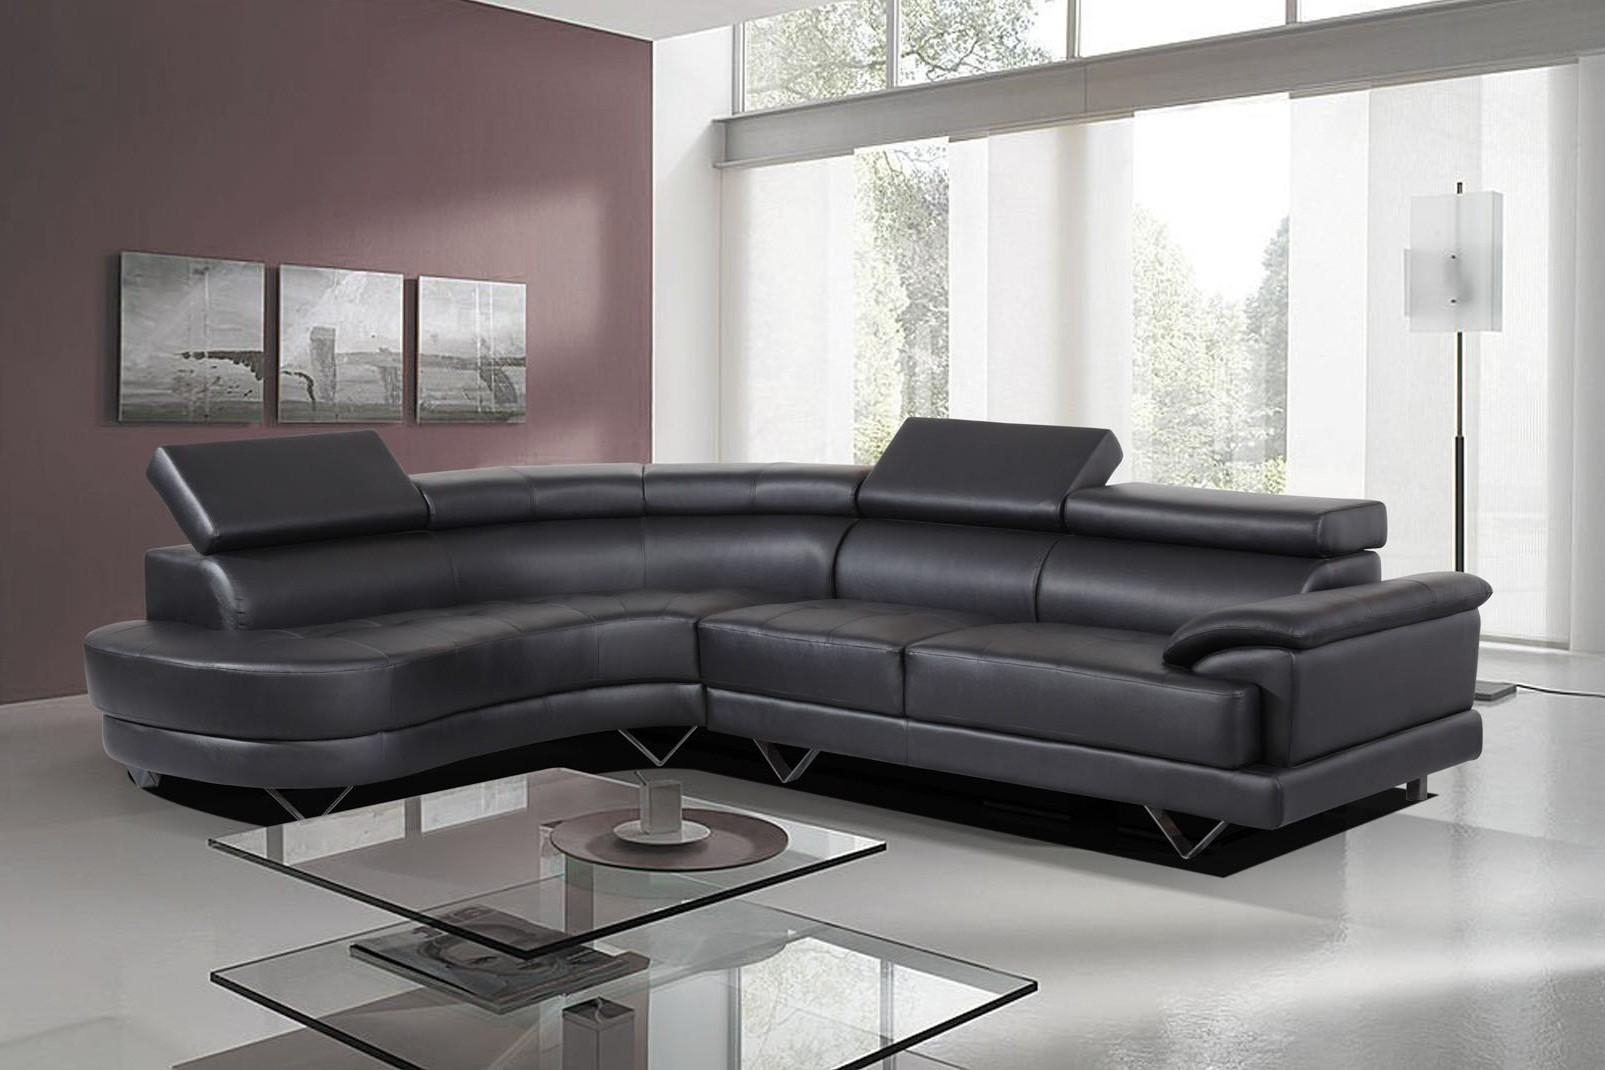 Sofa : Leather Modular Corner Sofa Cool Home Design Unique With With Unique Corner Sofas (View 5 of 21)